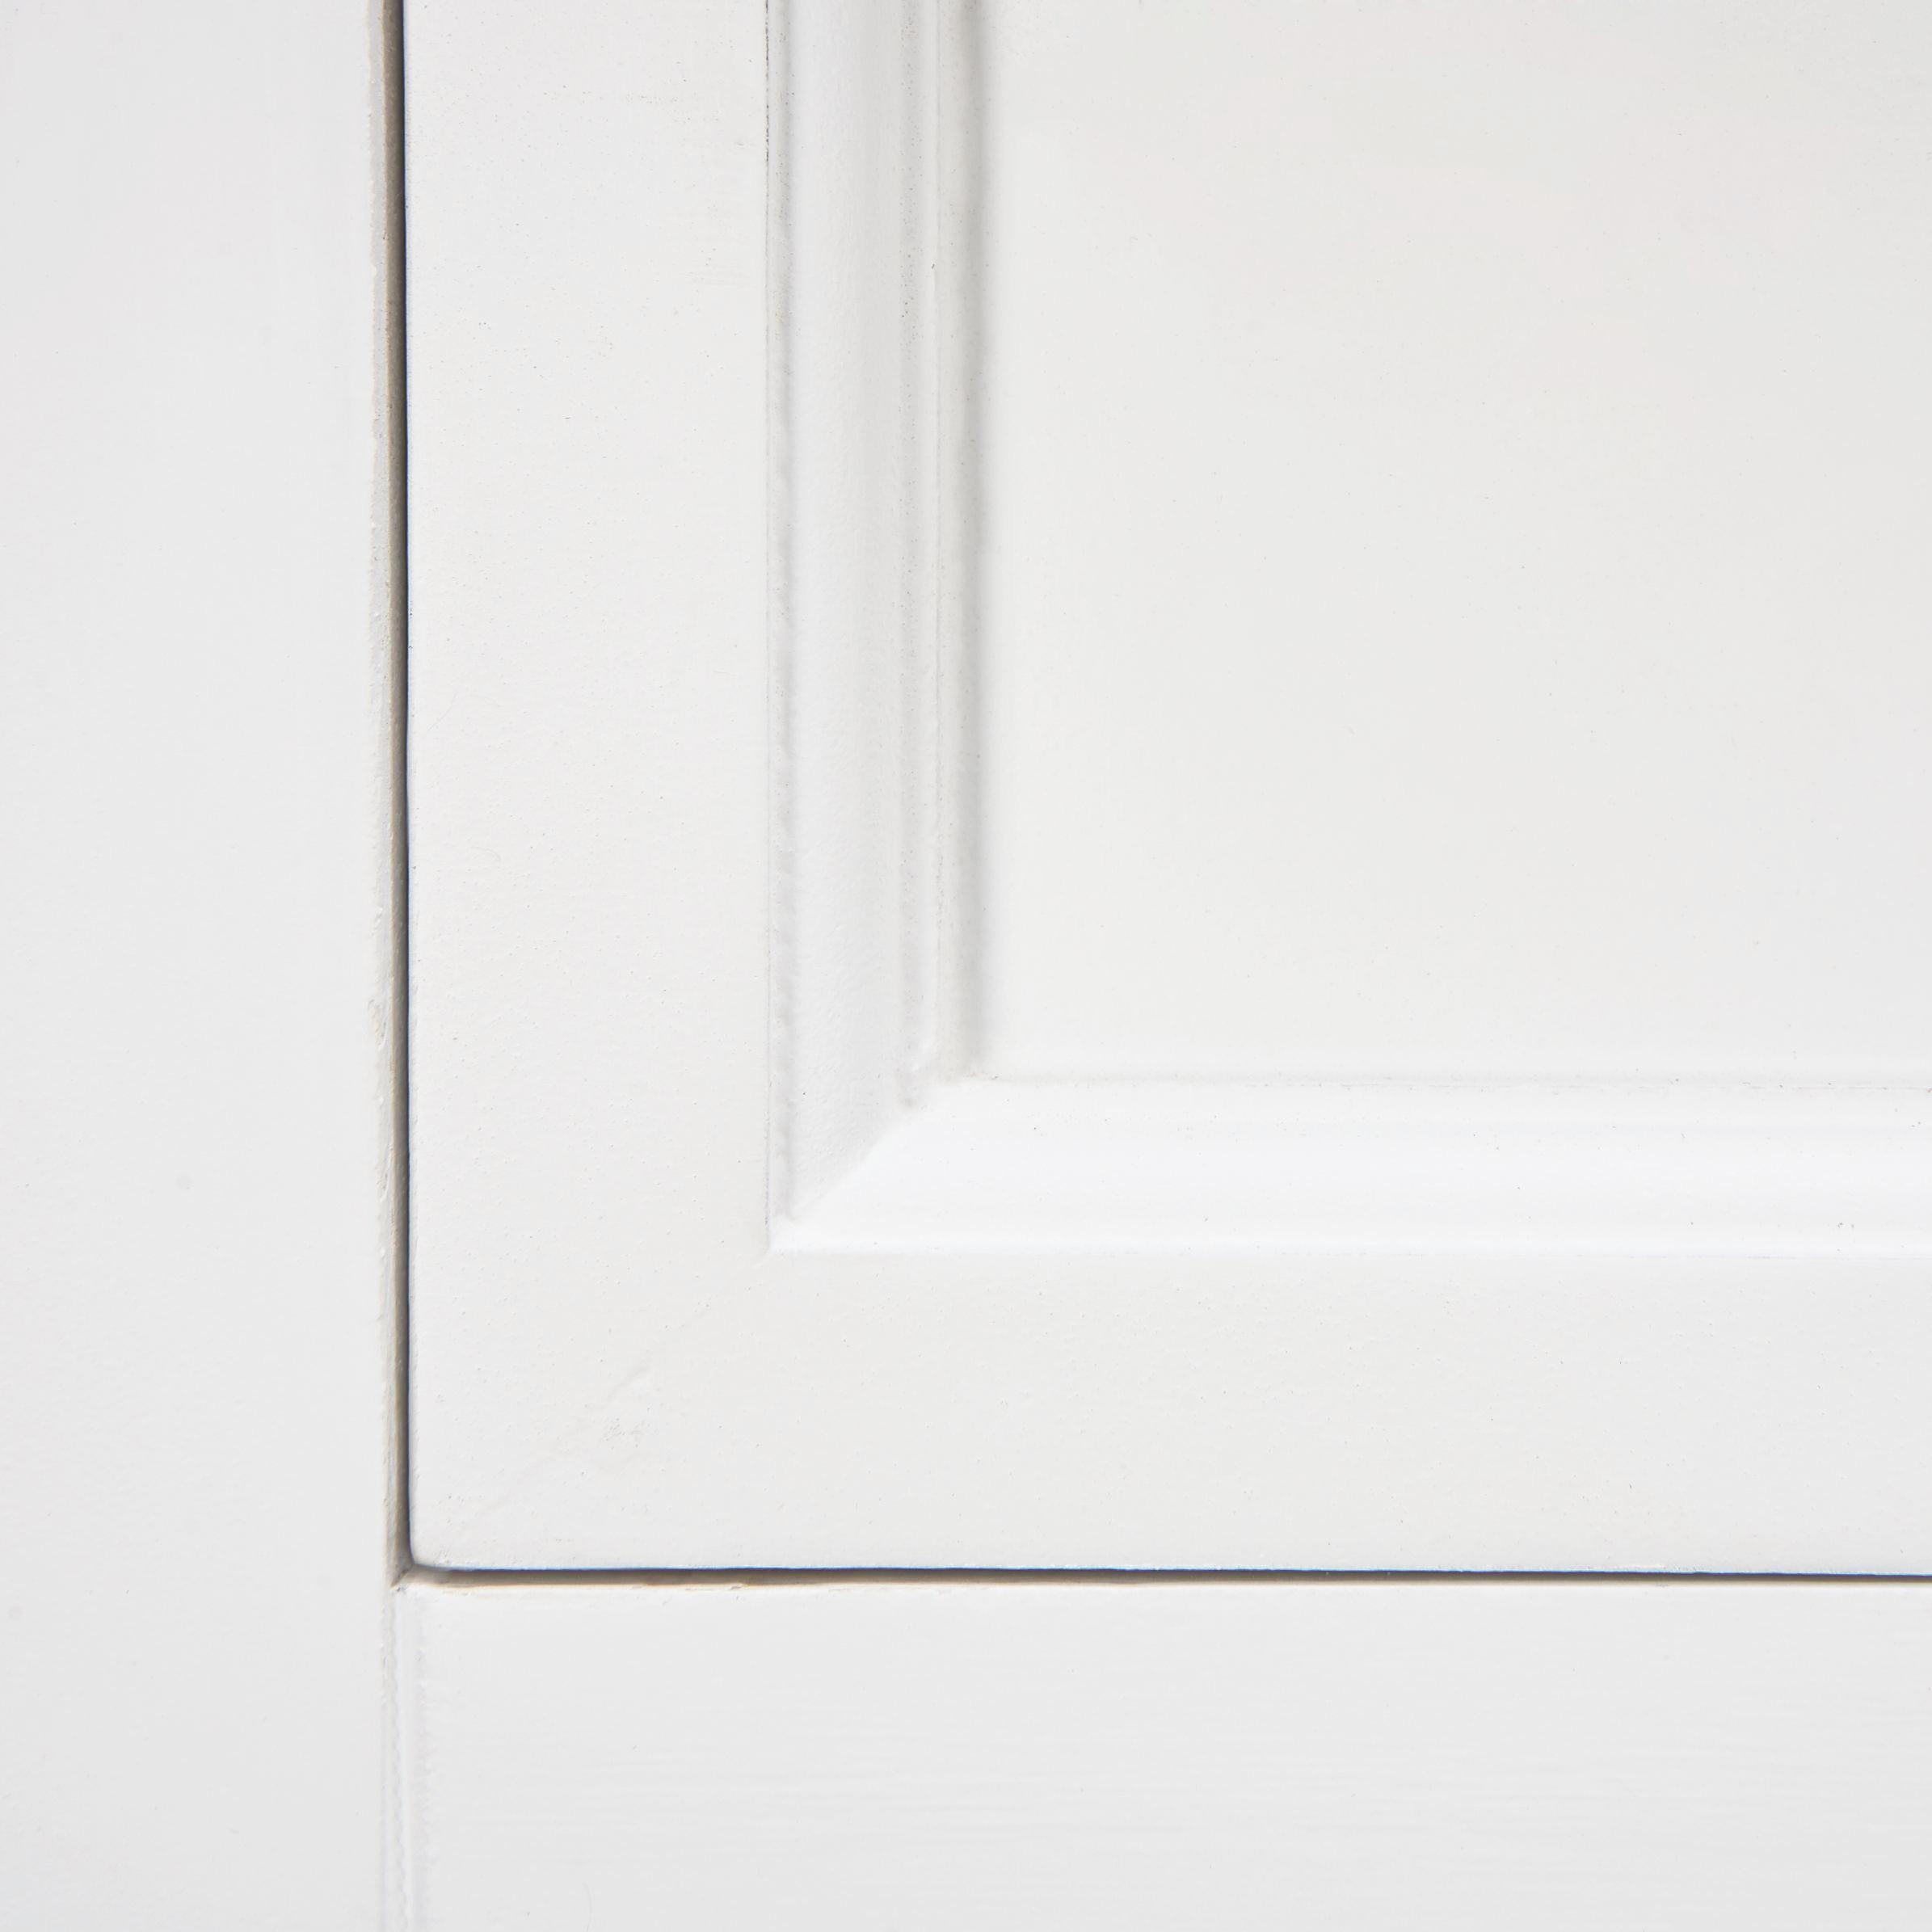 Sideboard Cookie - Braun/Weiß, Holz/Metall (120/88/37cm) - PREMIUM LIVING